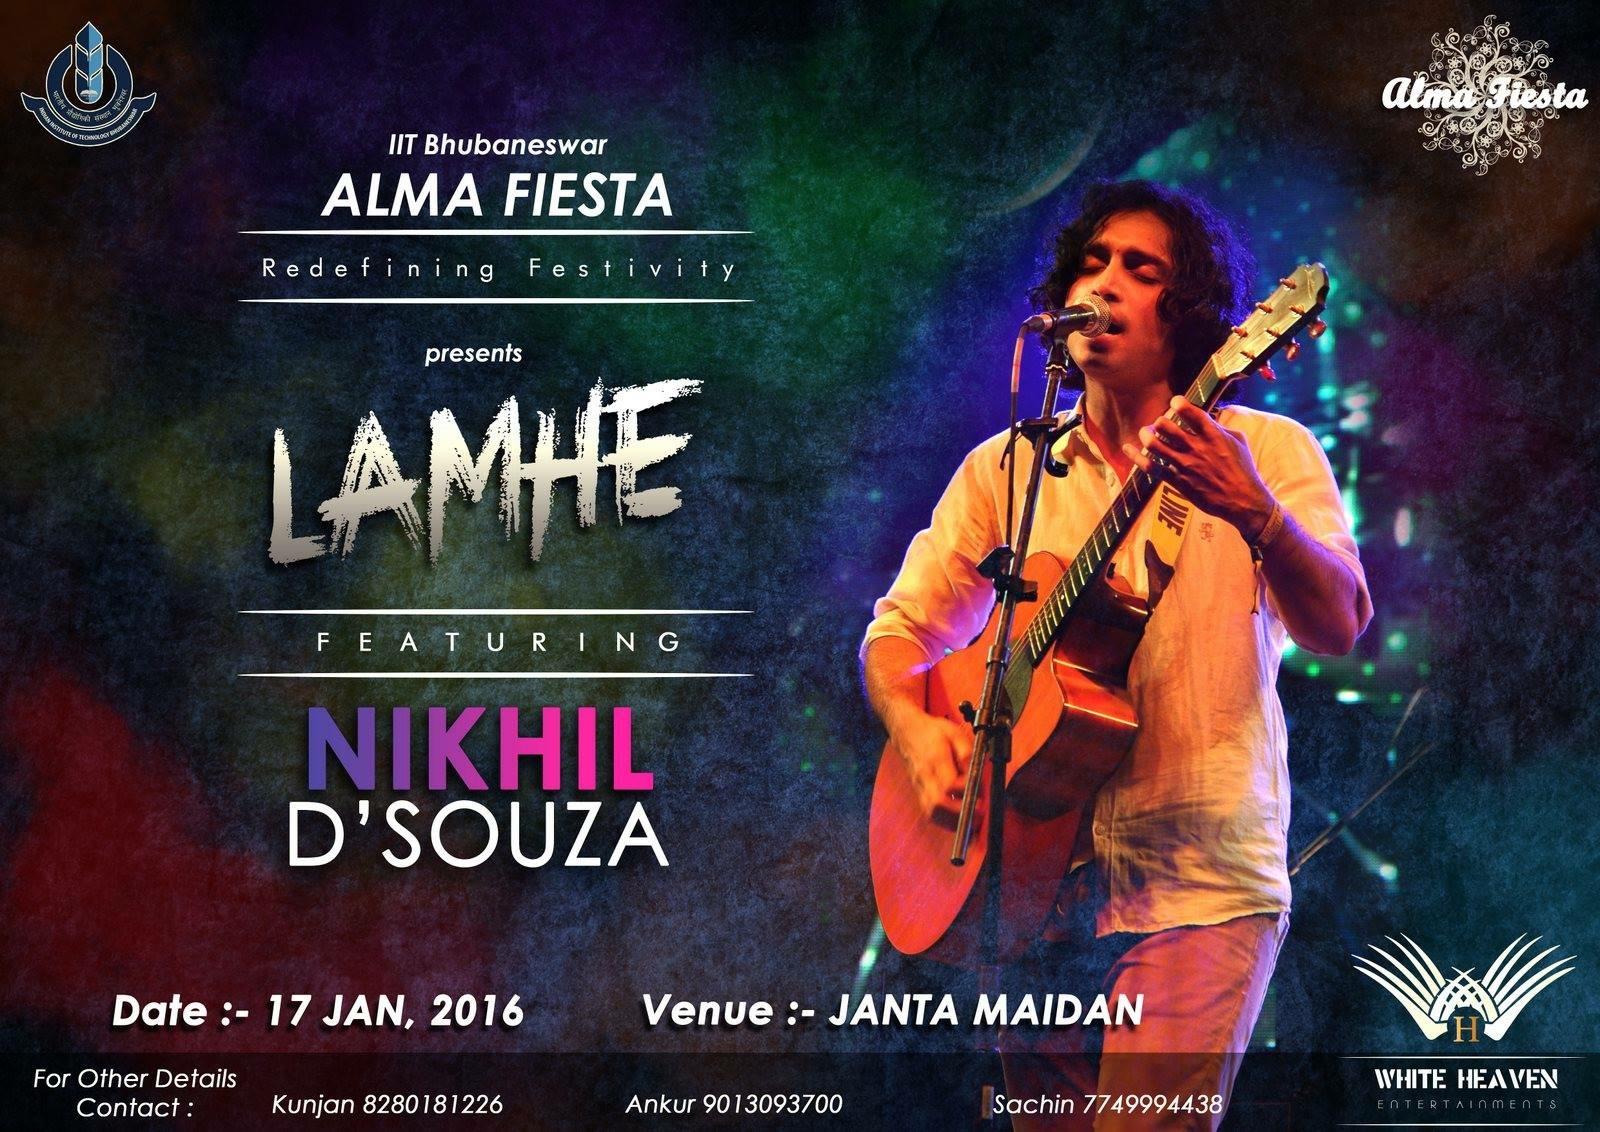 Lamhe - Nikhil D'Souza bubaneswar buzz